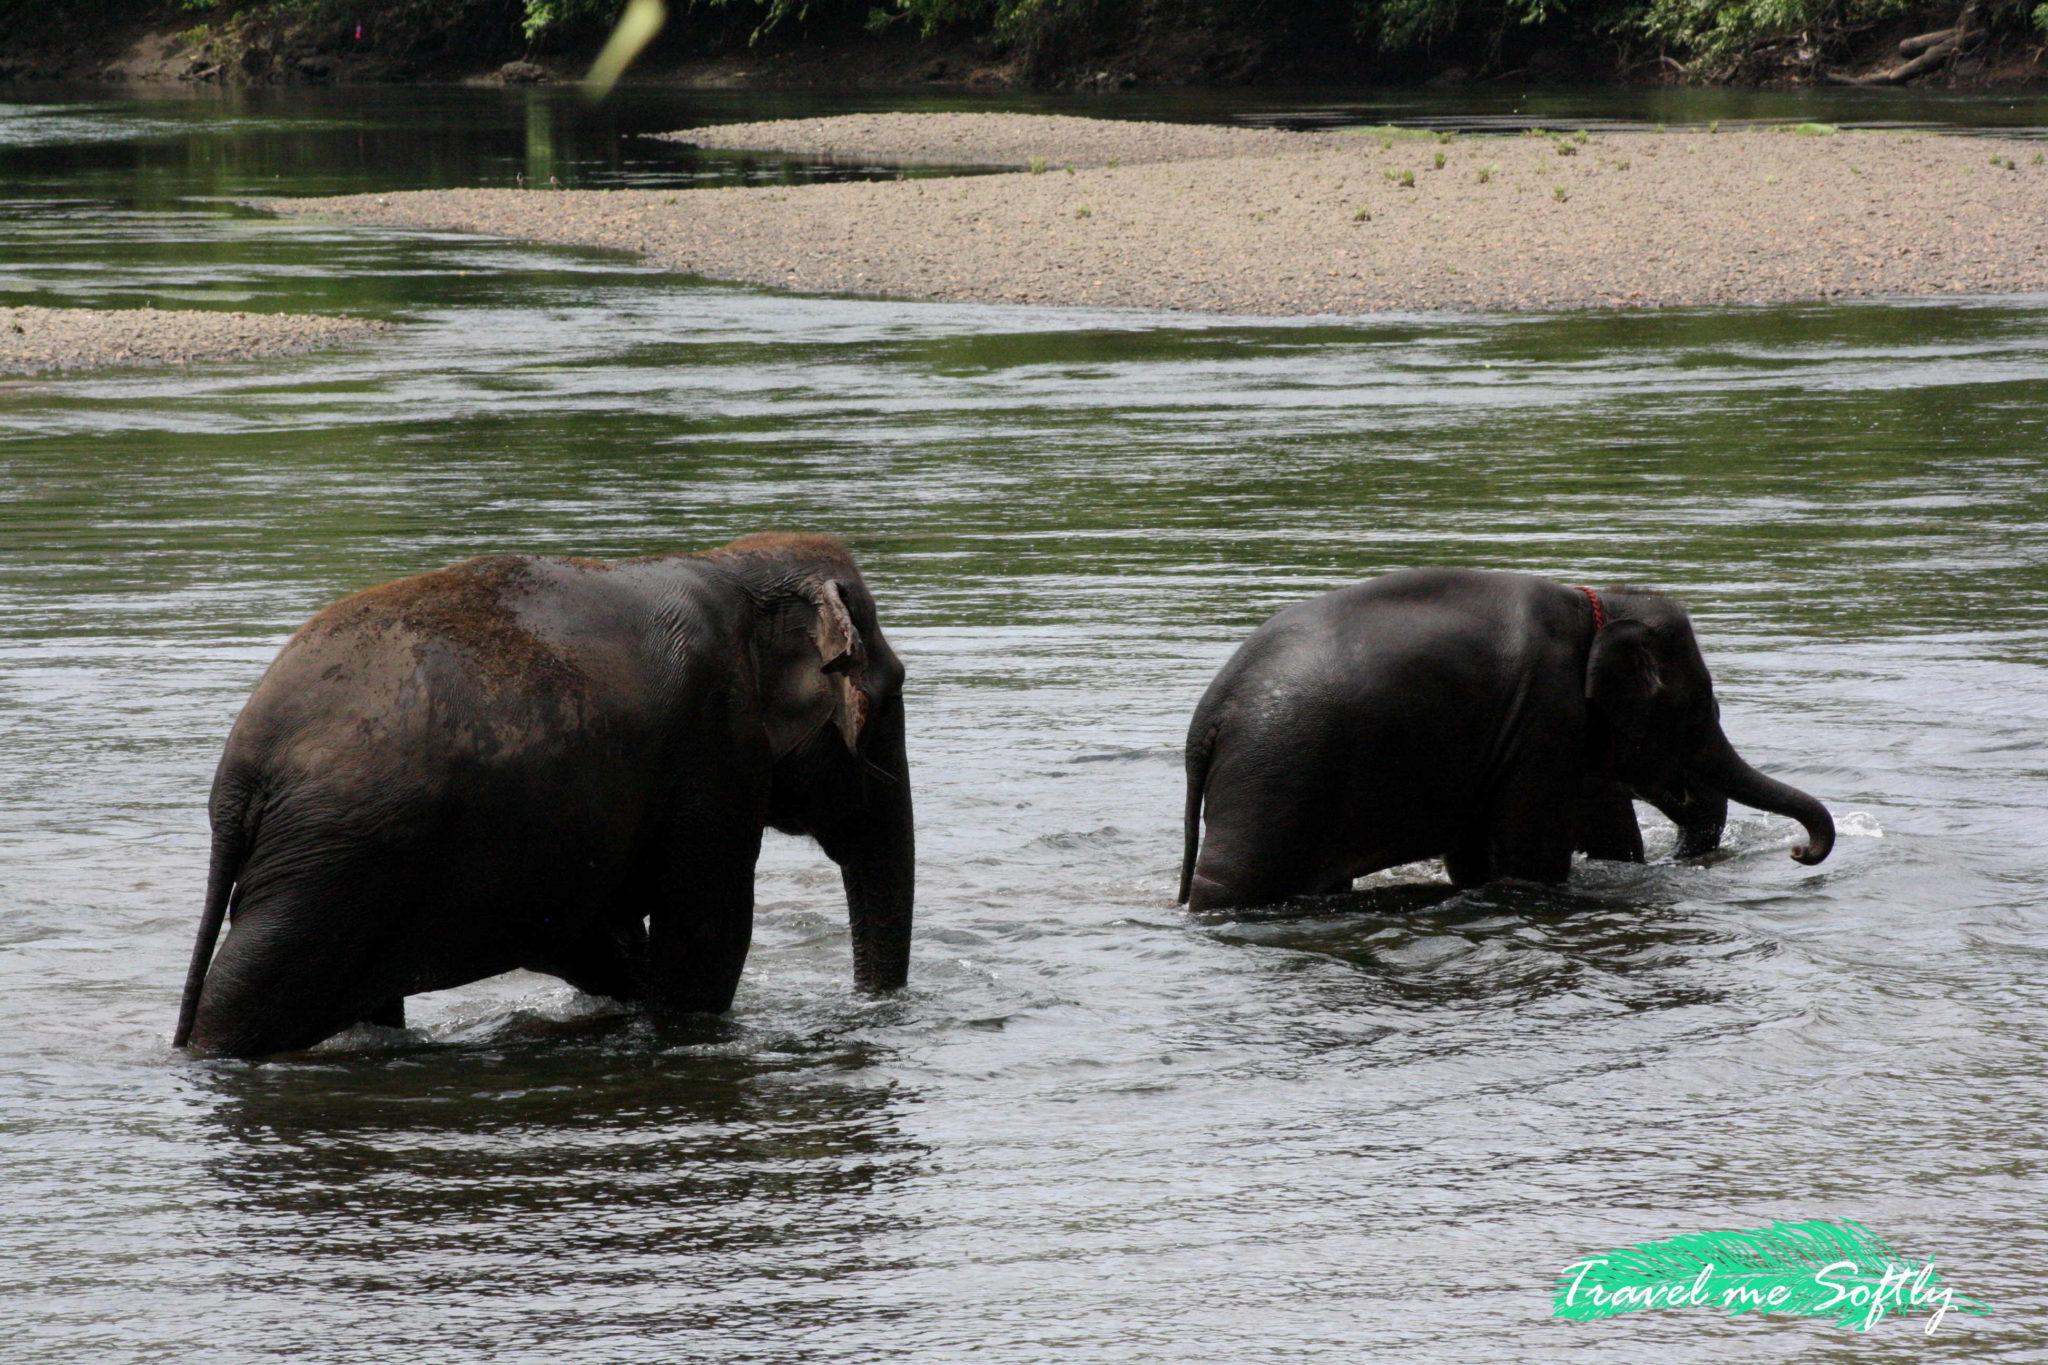 turismo responsable elefantes